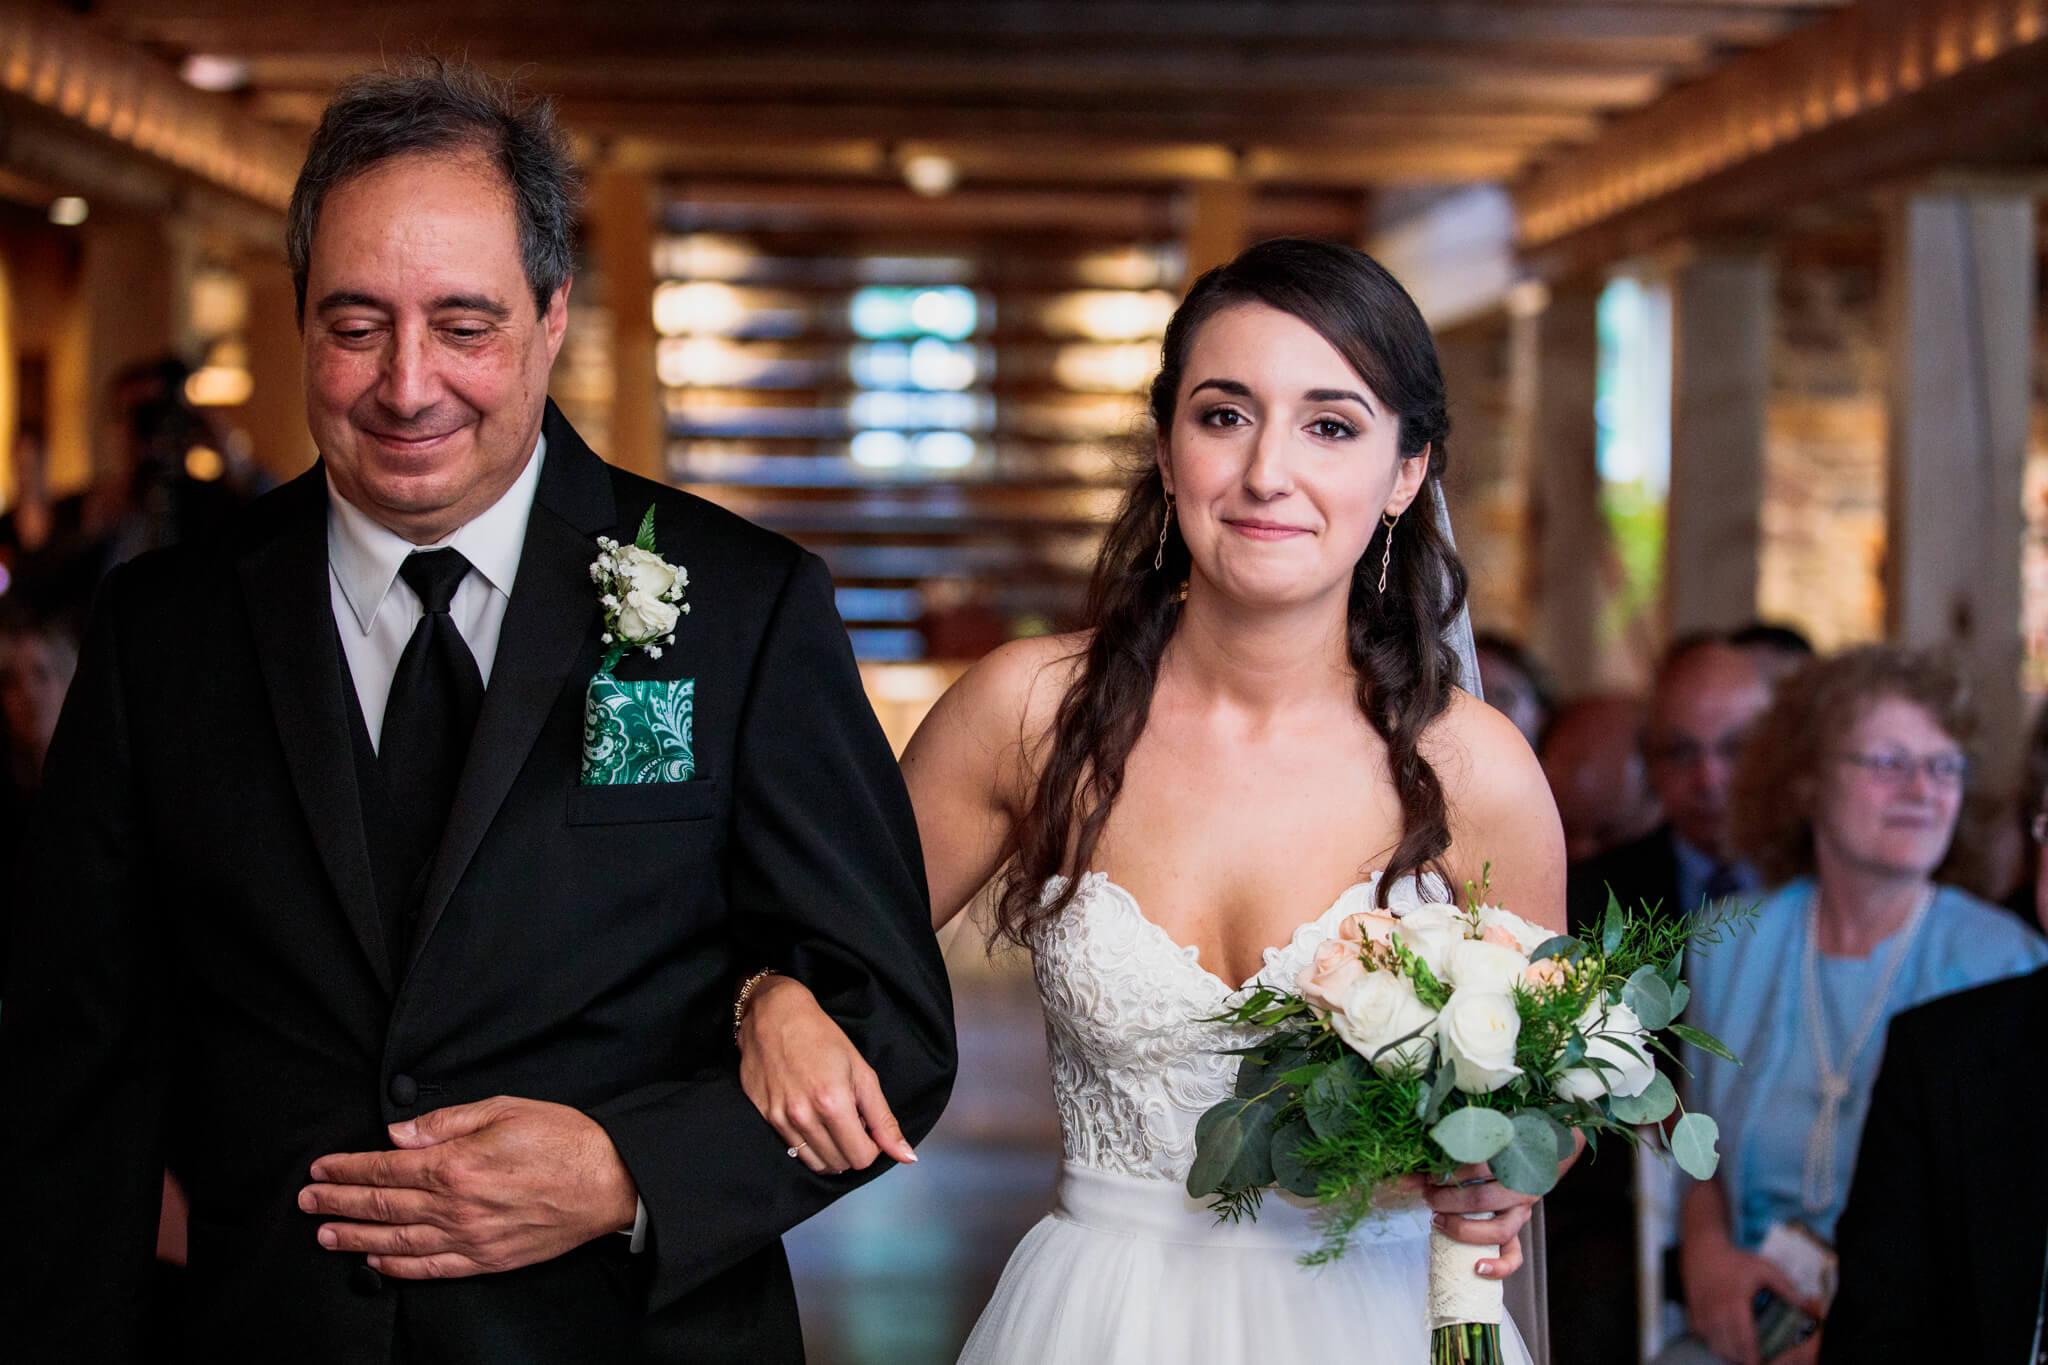 Alysia Jerad Homestead Blessings Farm Hershey PA Wedding Rustic Chique - 66.JPG